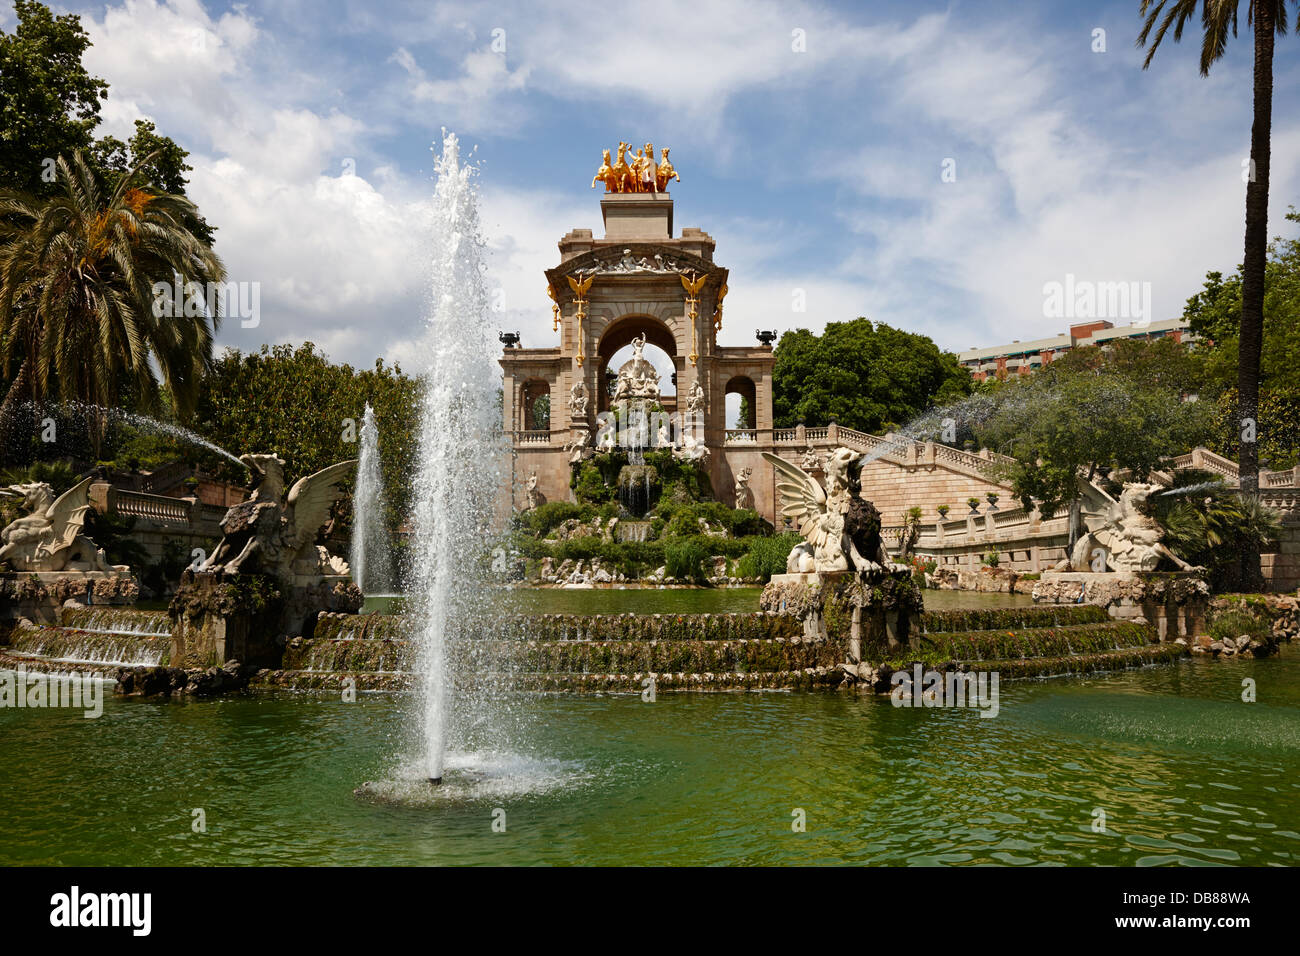 fontana monumental Parc de la Ciutadella Barcelona Catalonia Spain - Stock Image